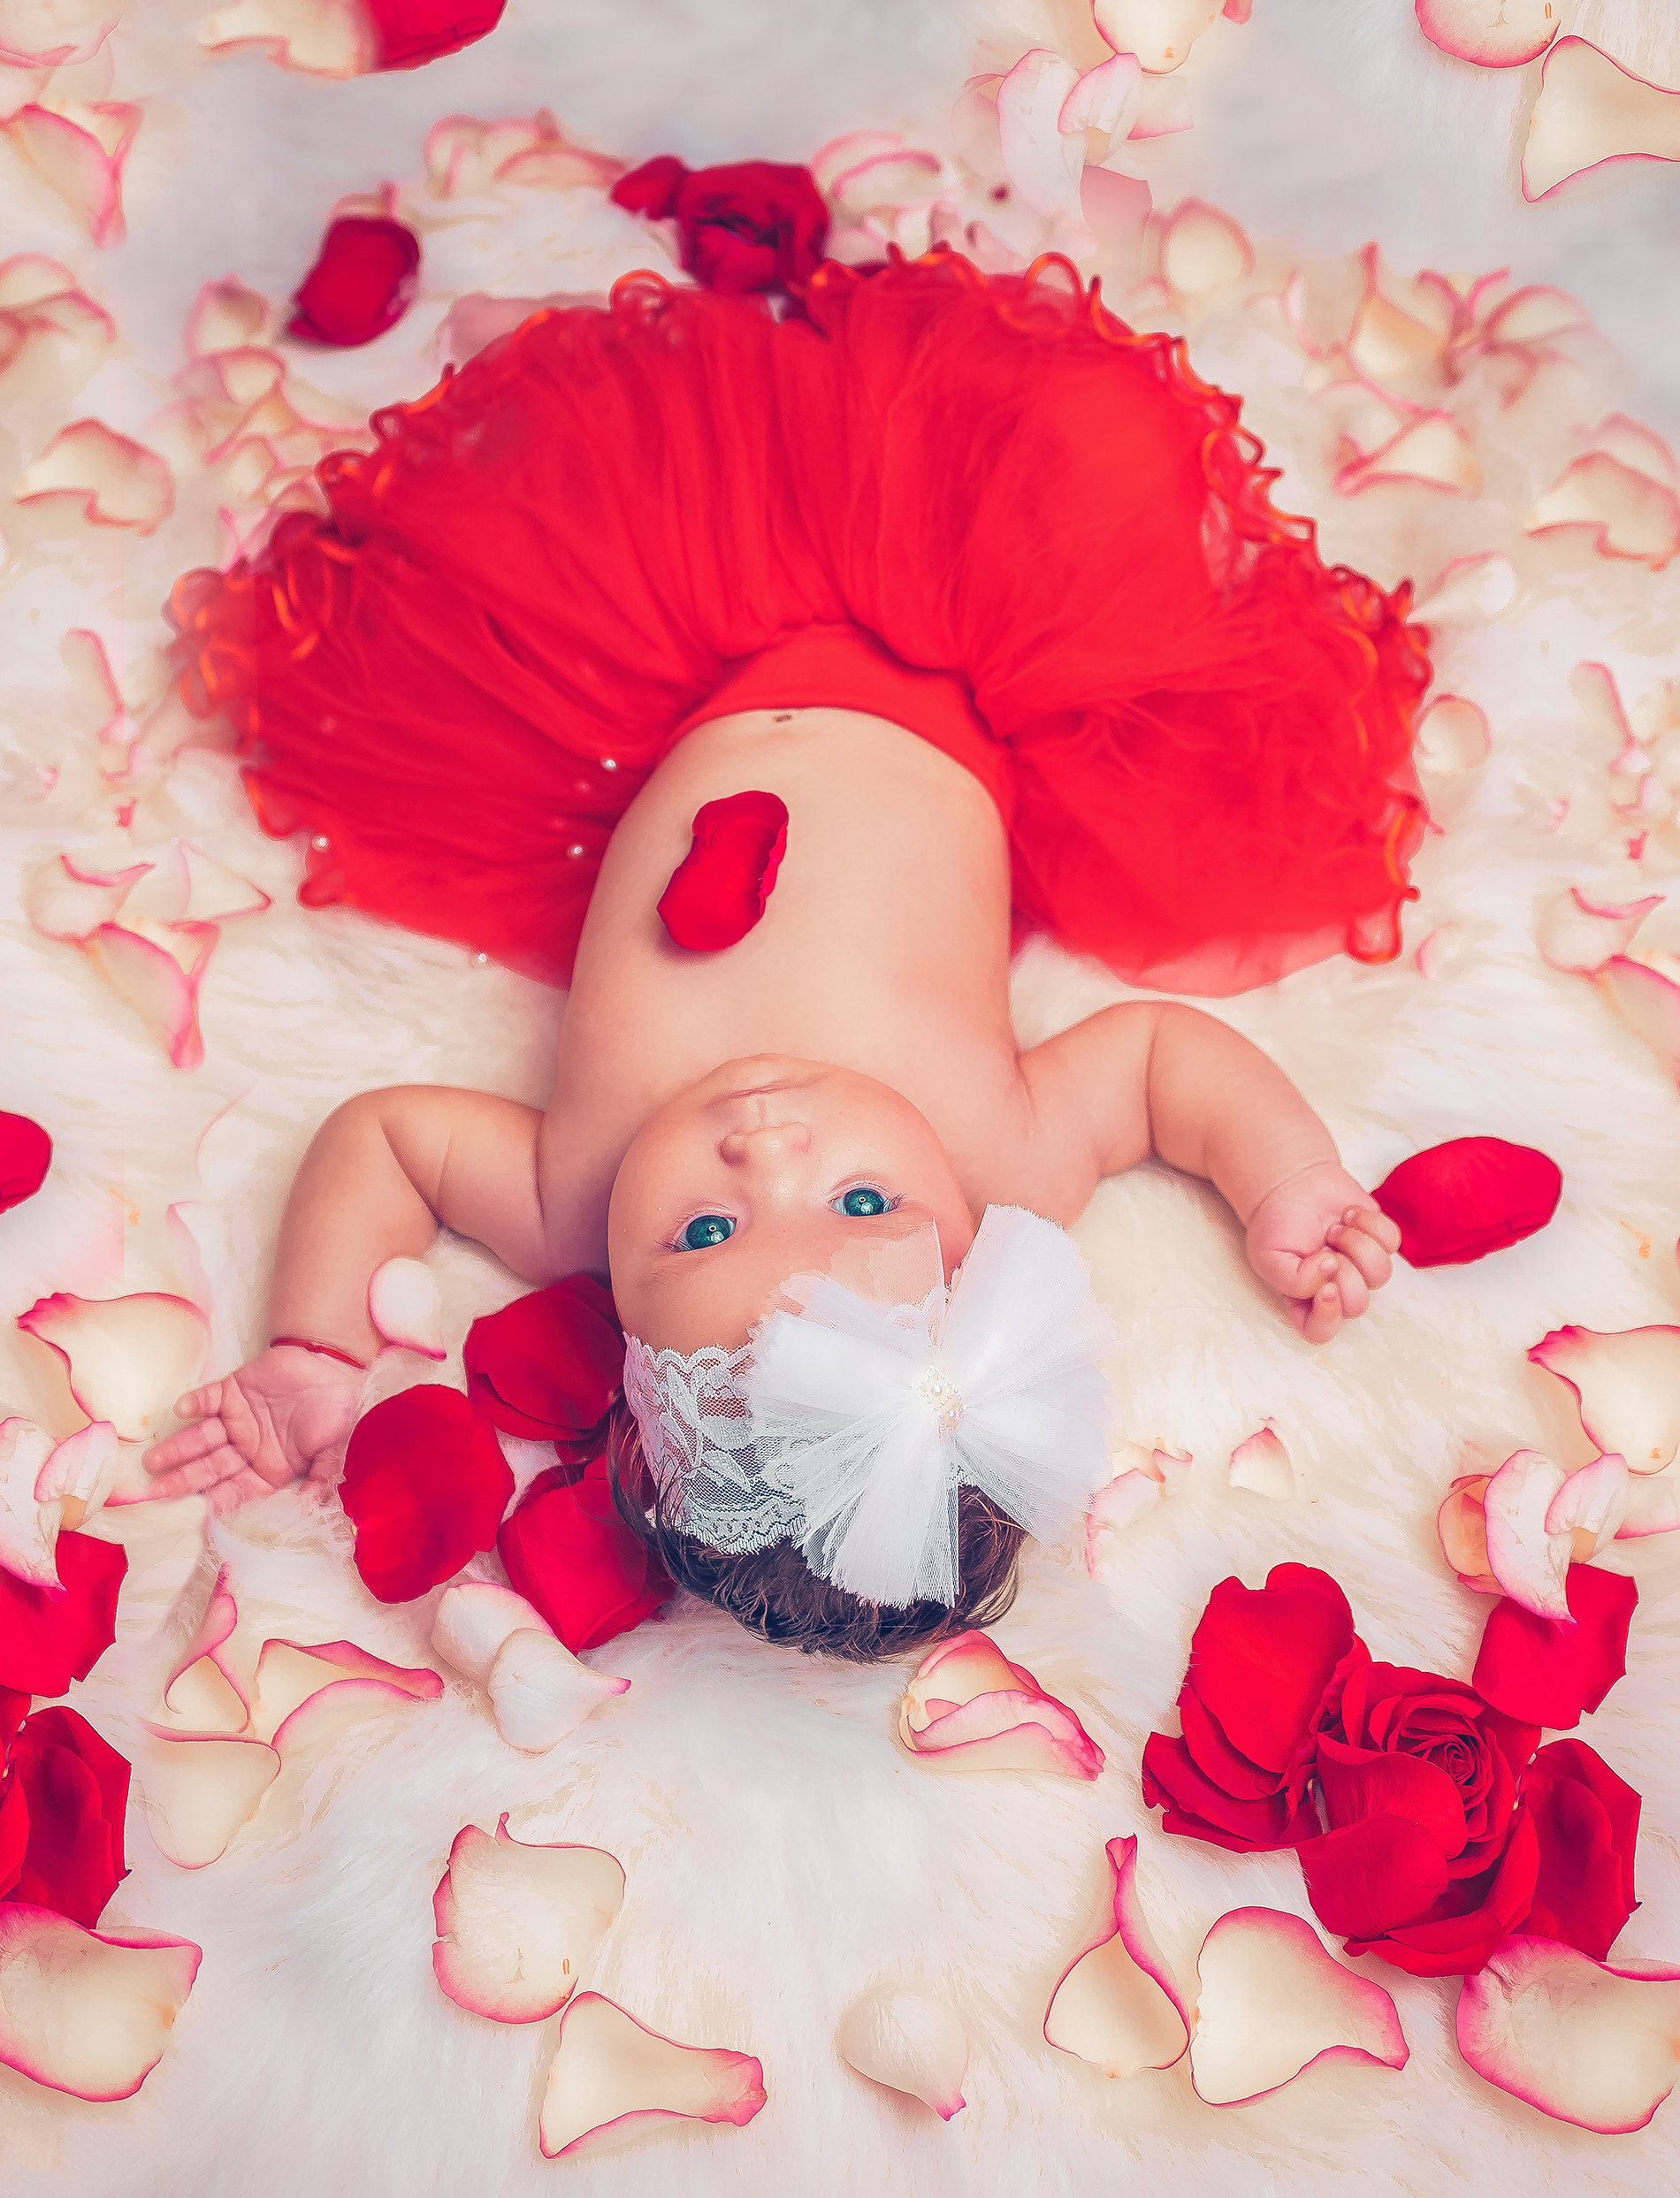 crina popescu sedinta foto bebe copil bucuresti studio